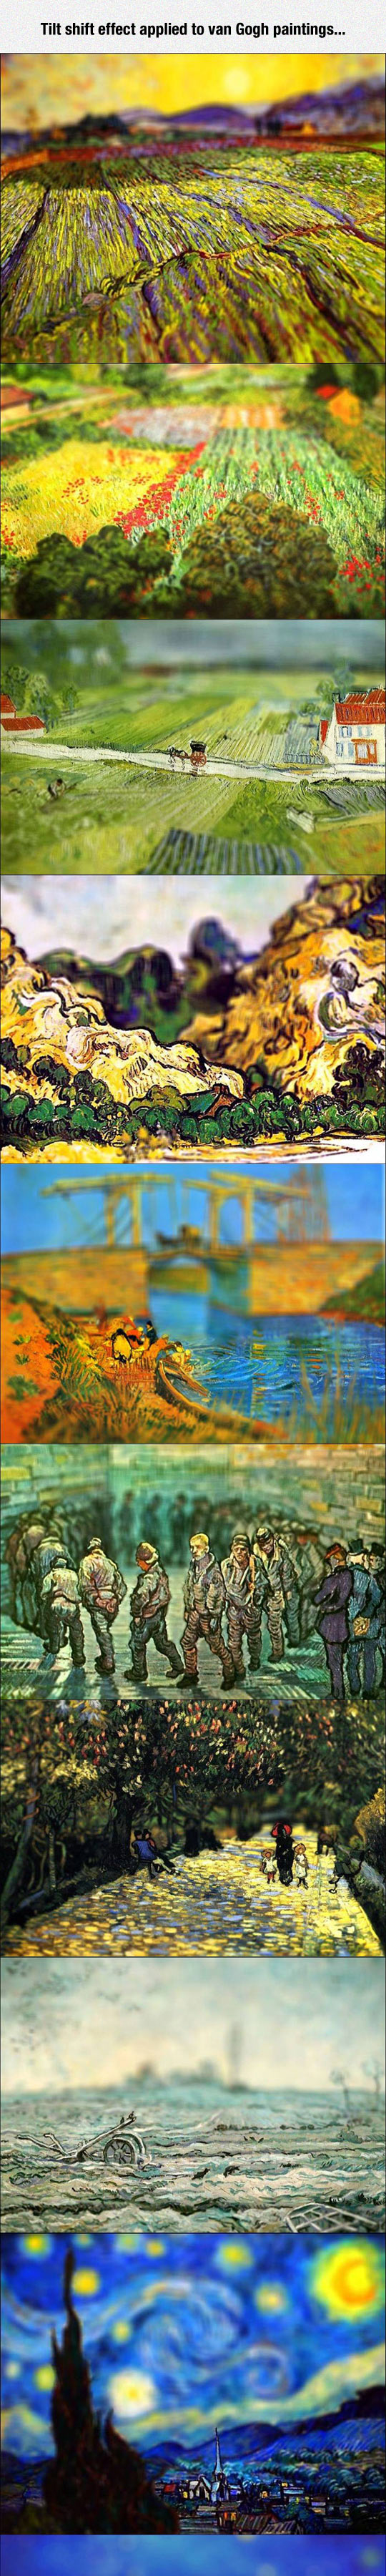 funny-Van-Gogh-shift-effect-painting